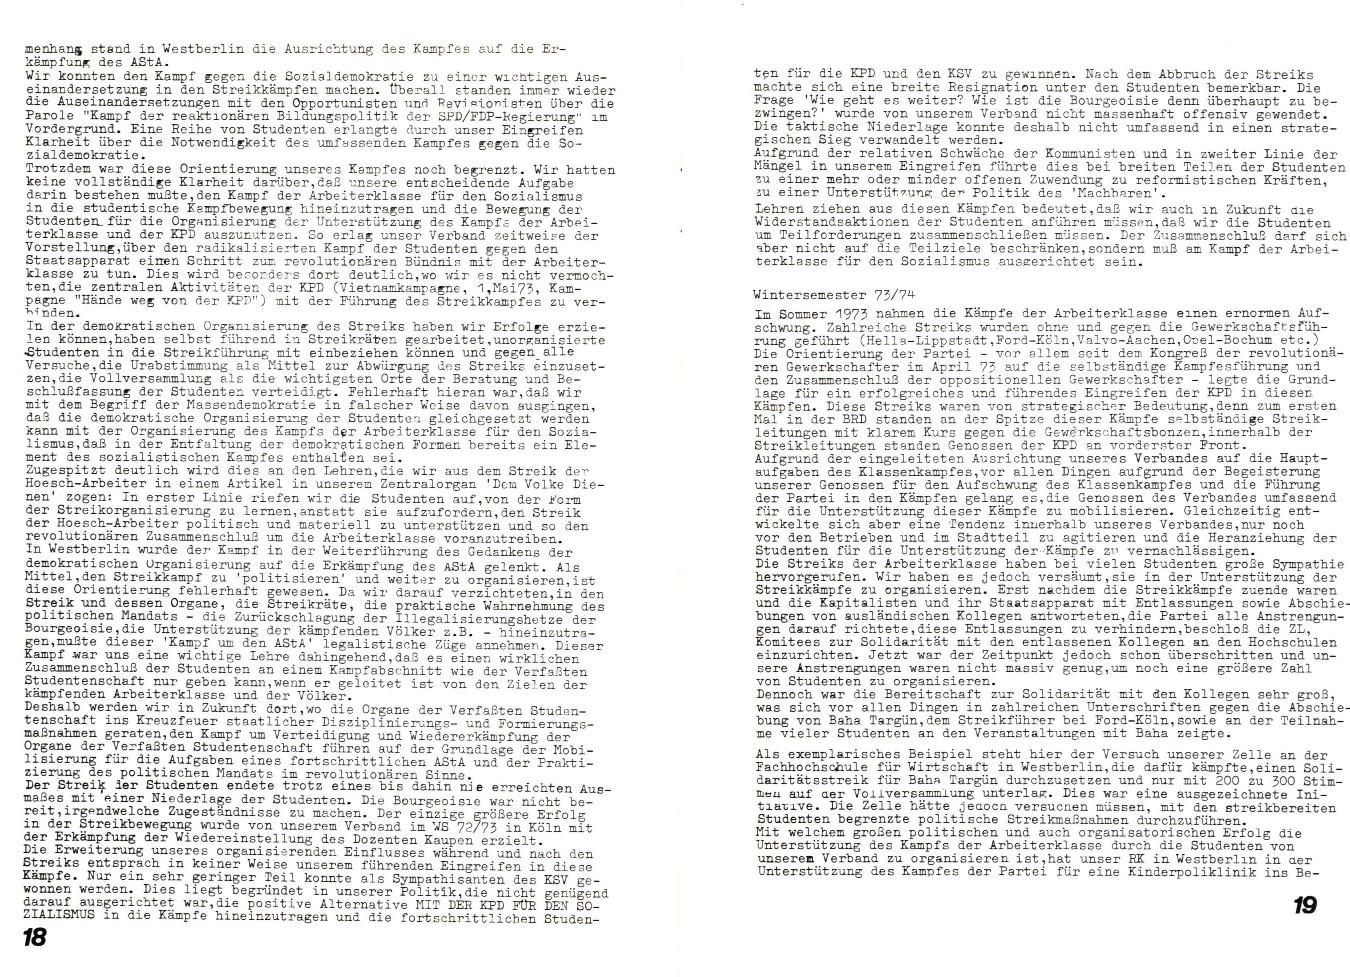 KSV_1974_Rechenschaftsbericht_11